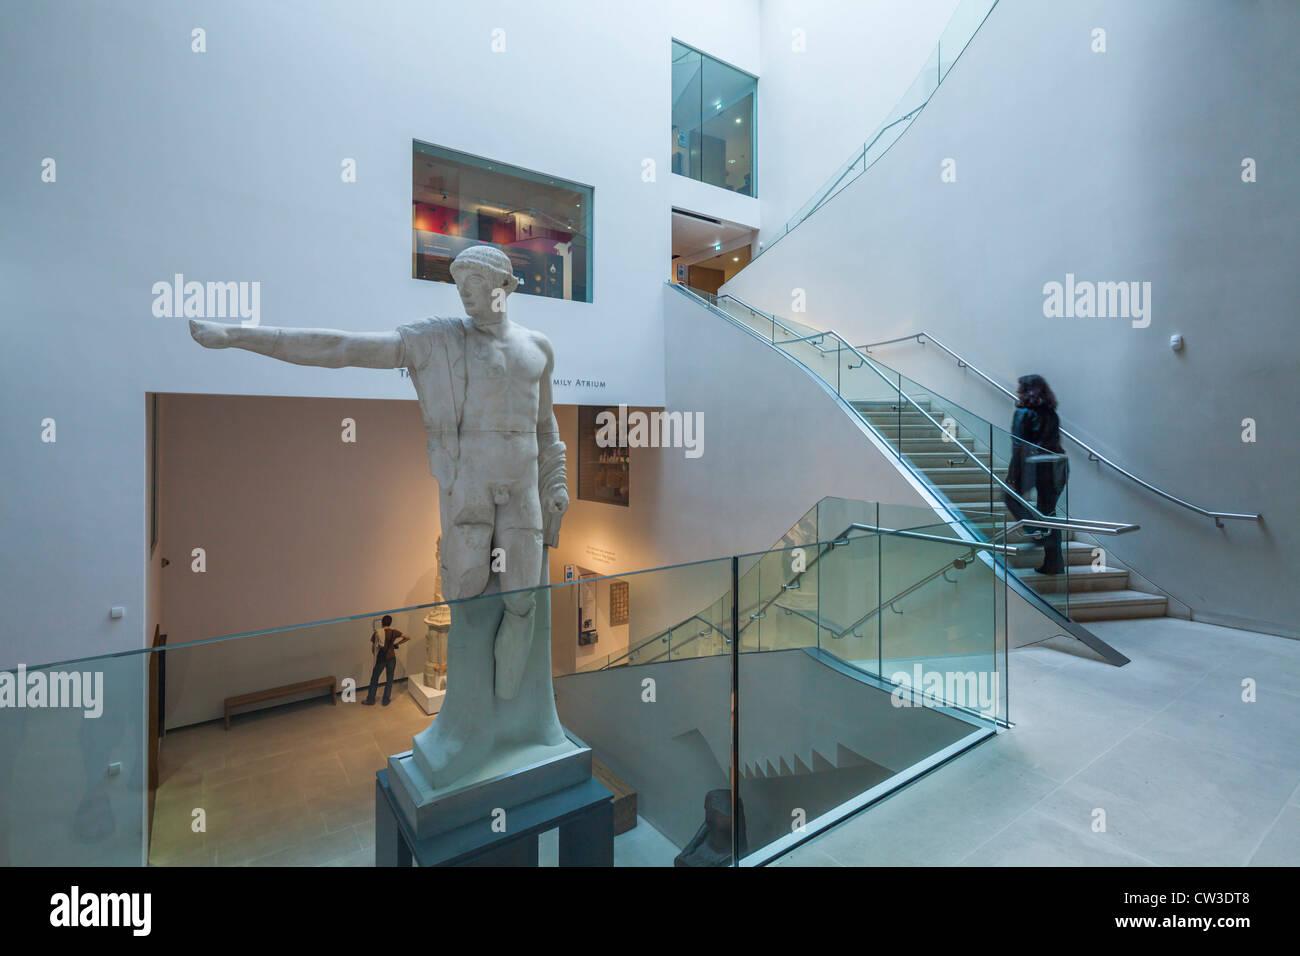 New Ashmolean Museum Interiors, Oxford - Stock Image